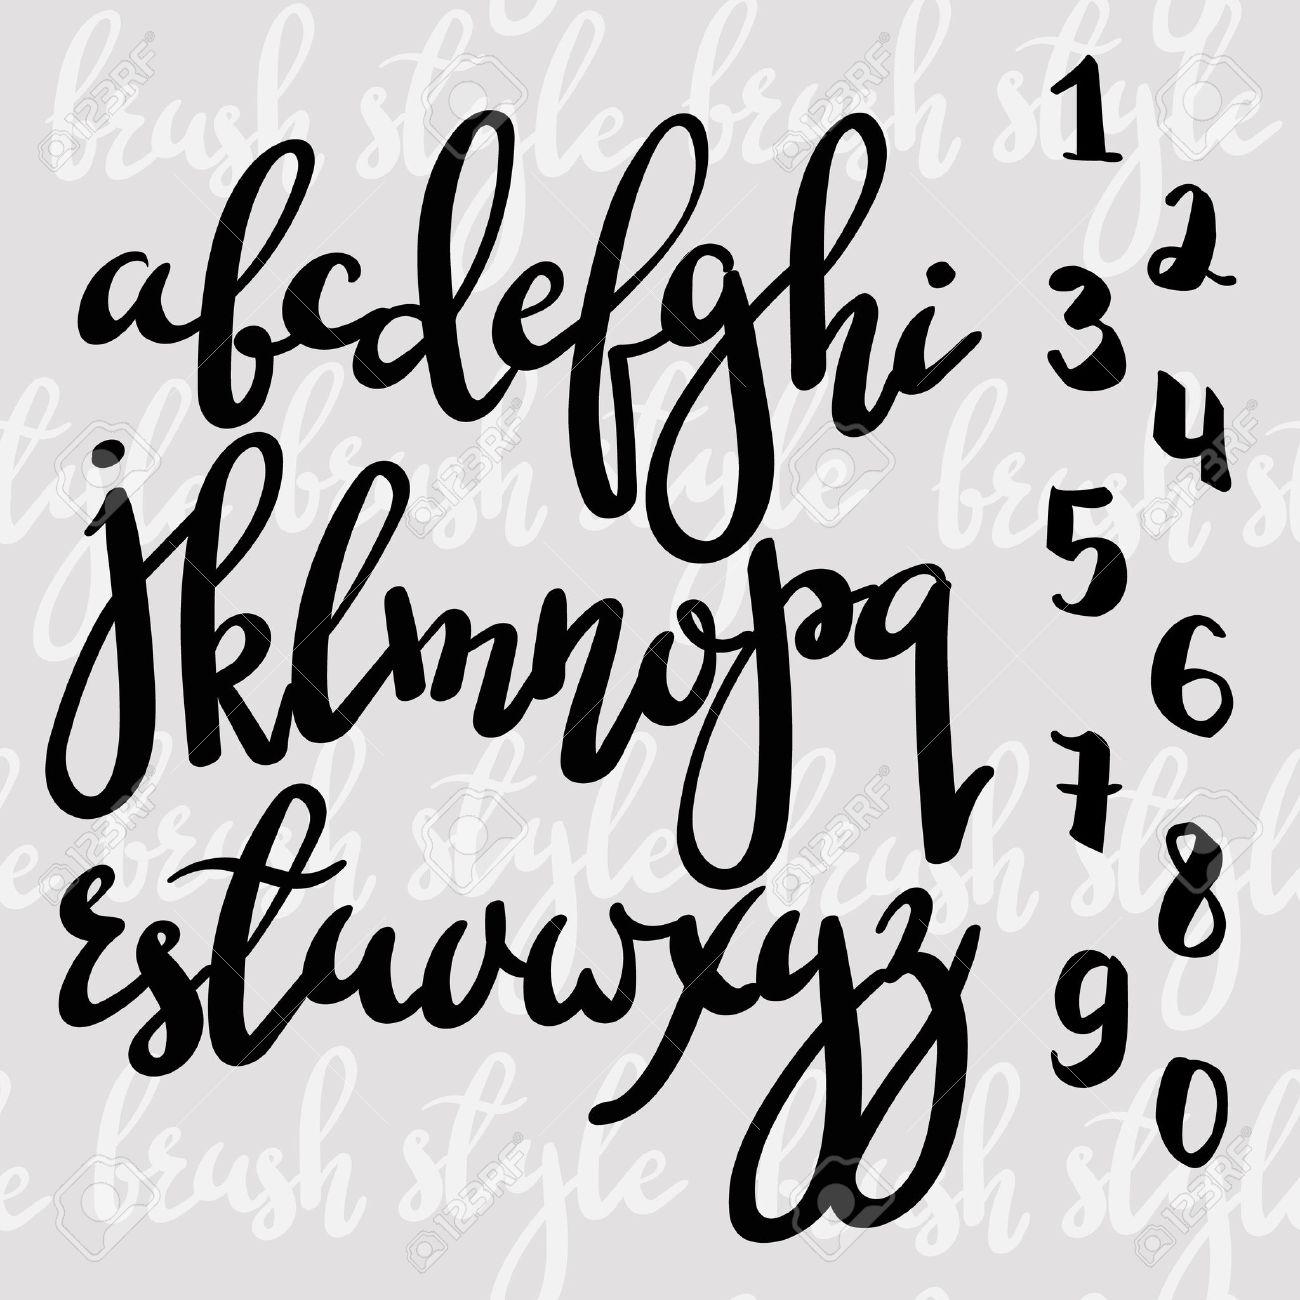 handwritten brush pen modern calligraphy font stock vector 46642068